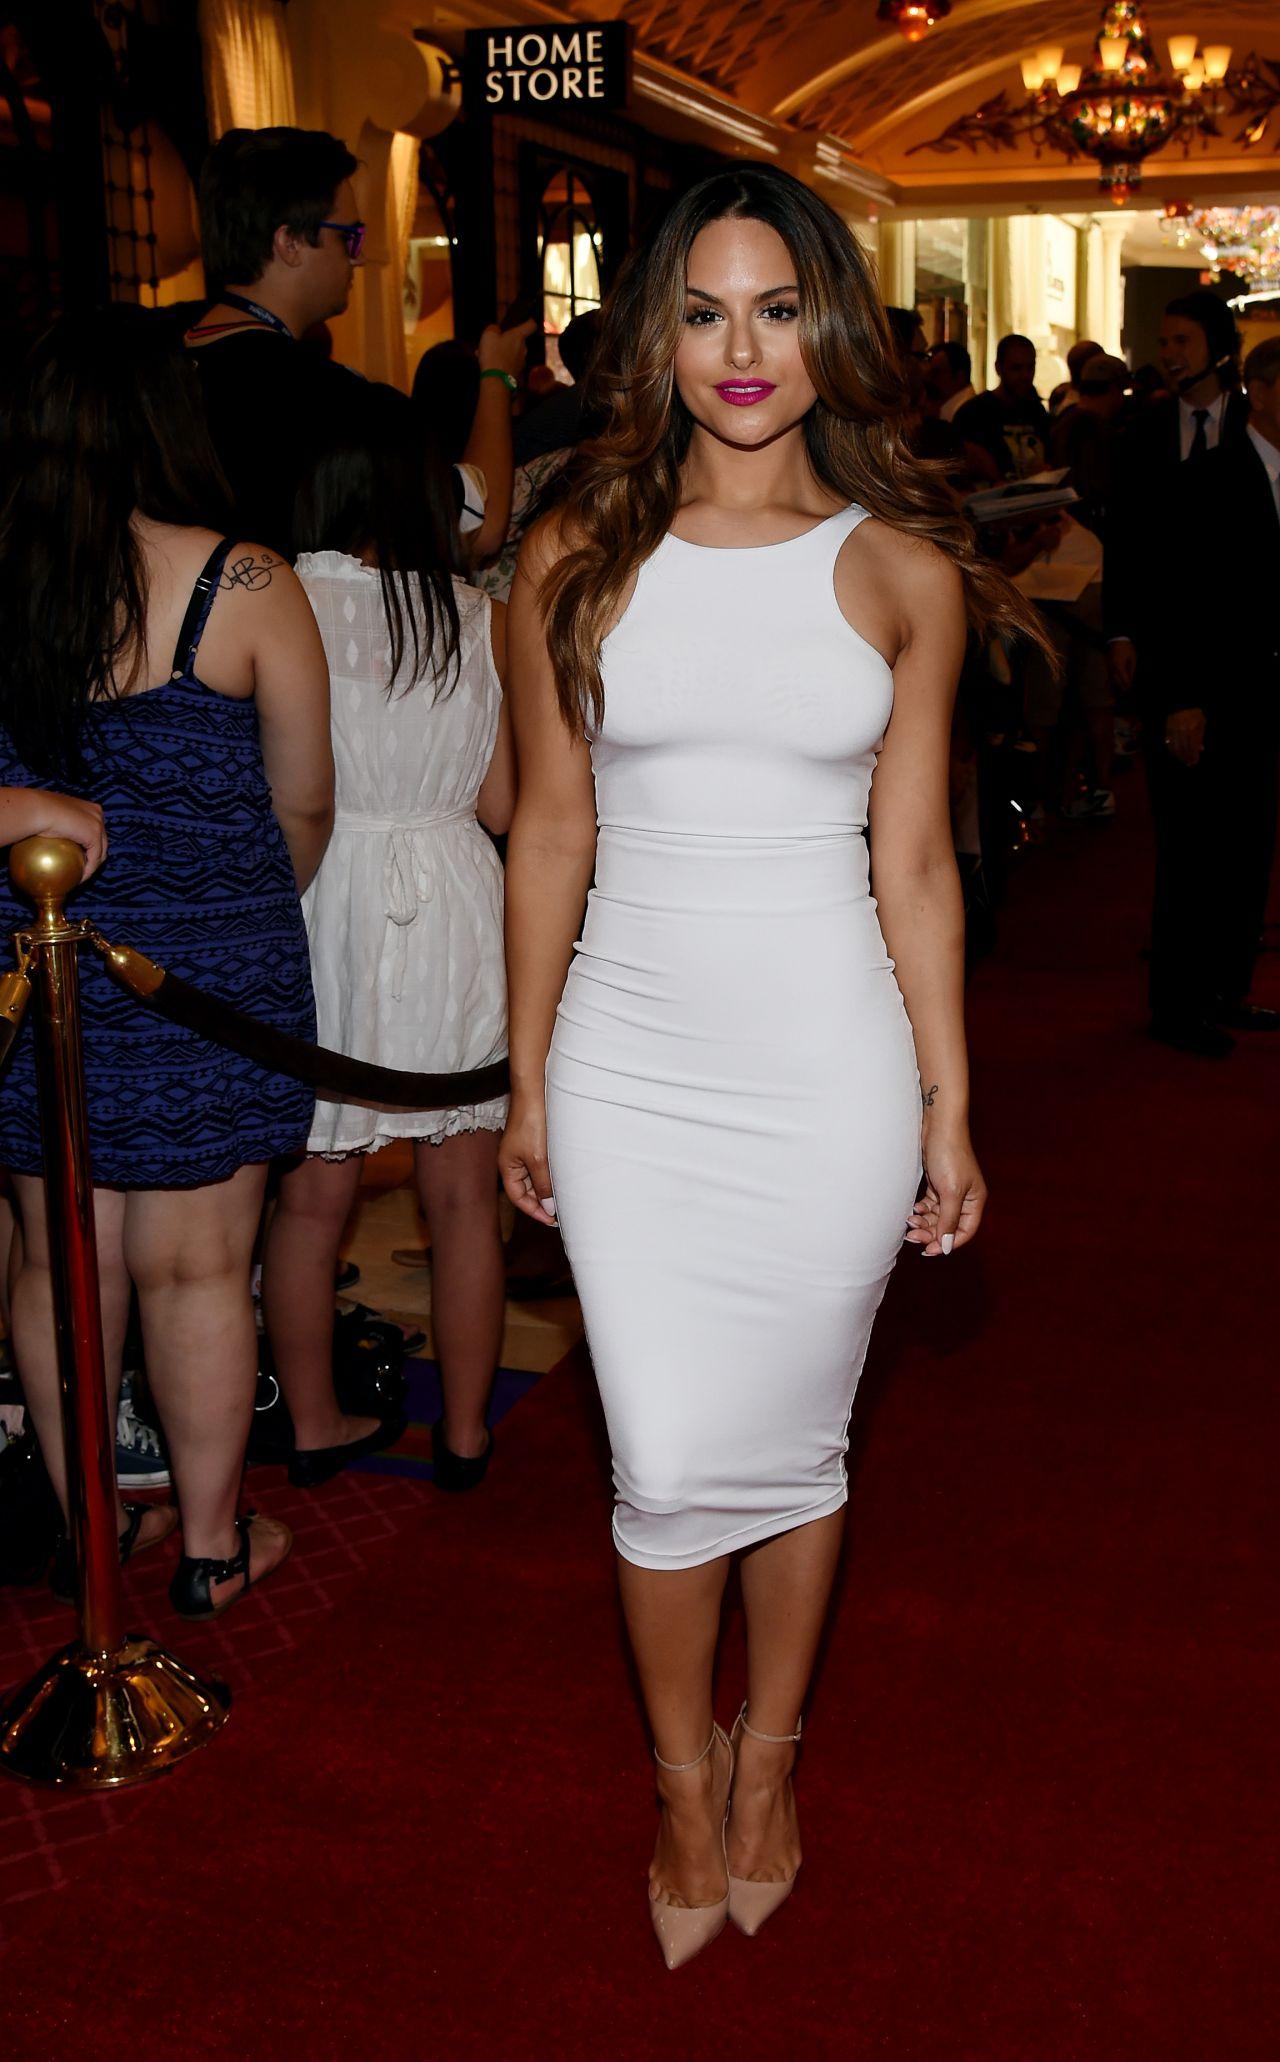 Sexy vegas dress